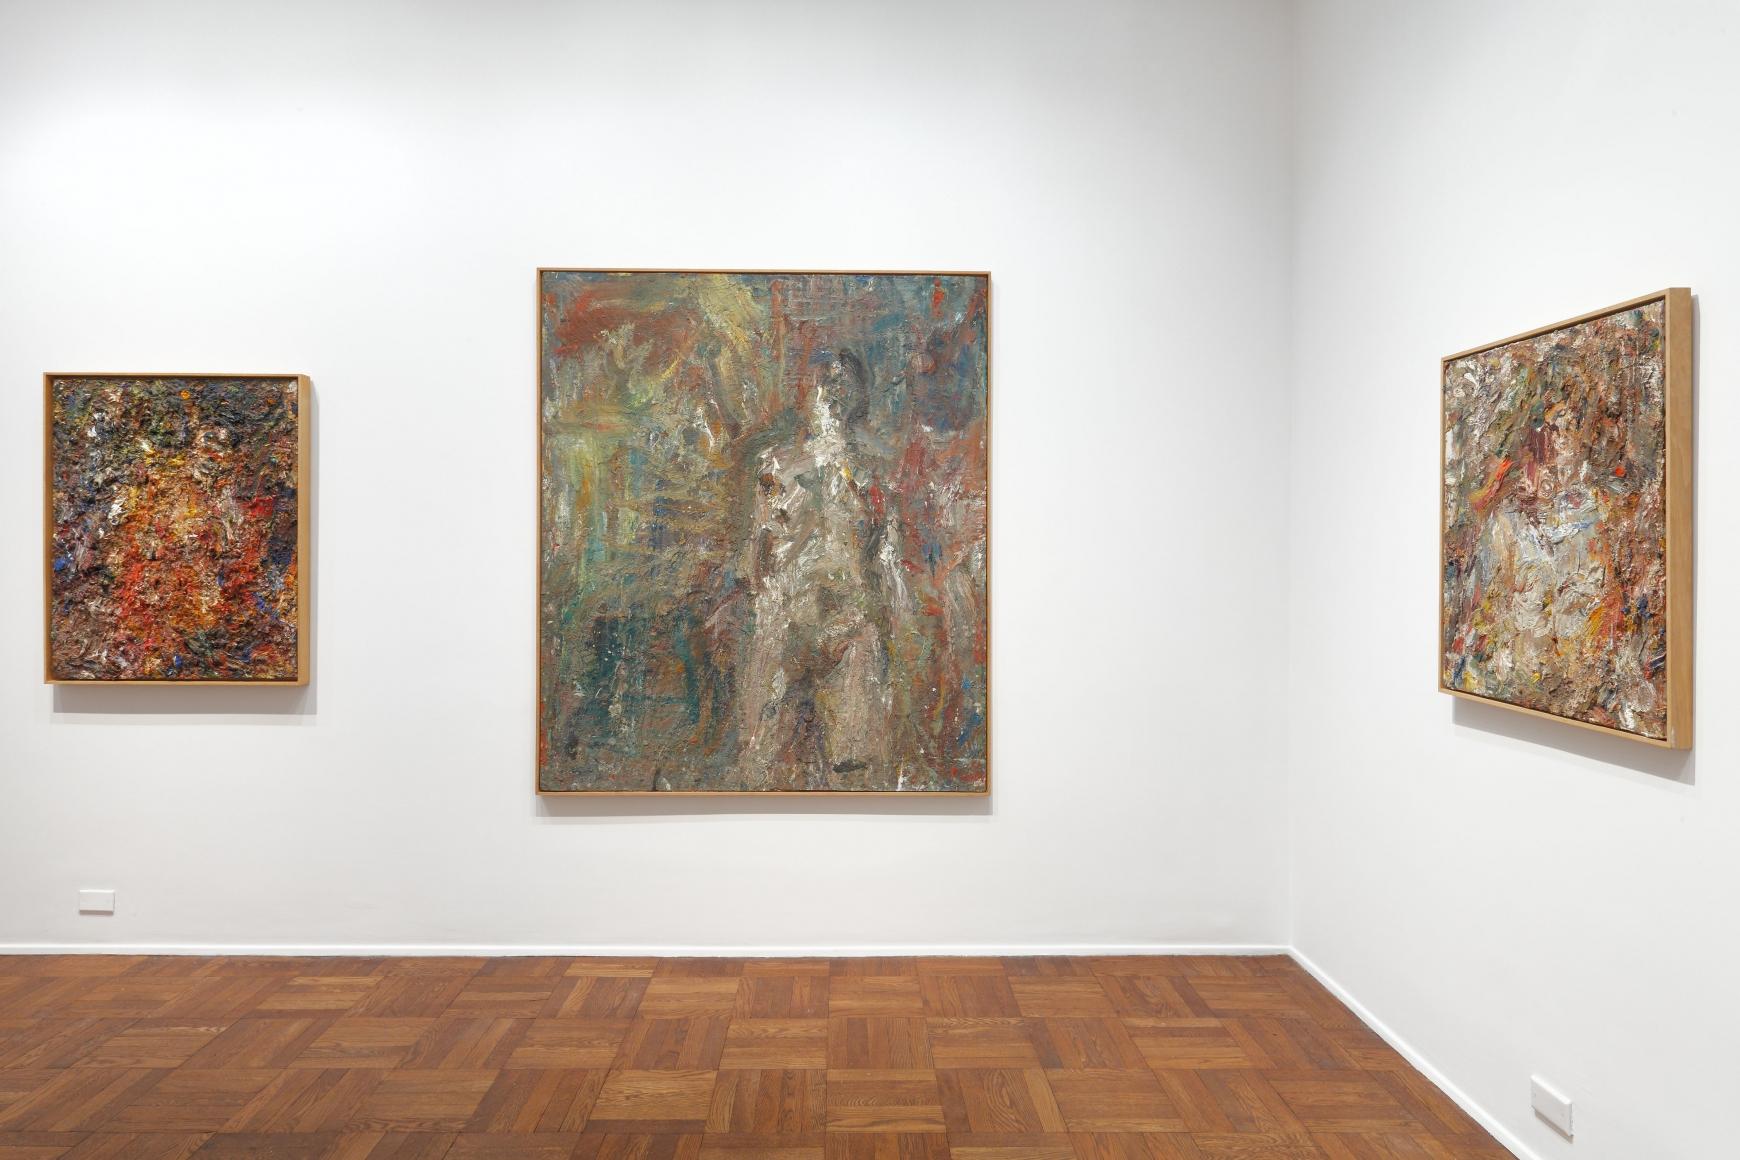 EUGÈNE LEROY, Nudes, New York, 2012, Installation Image 4